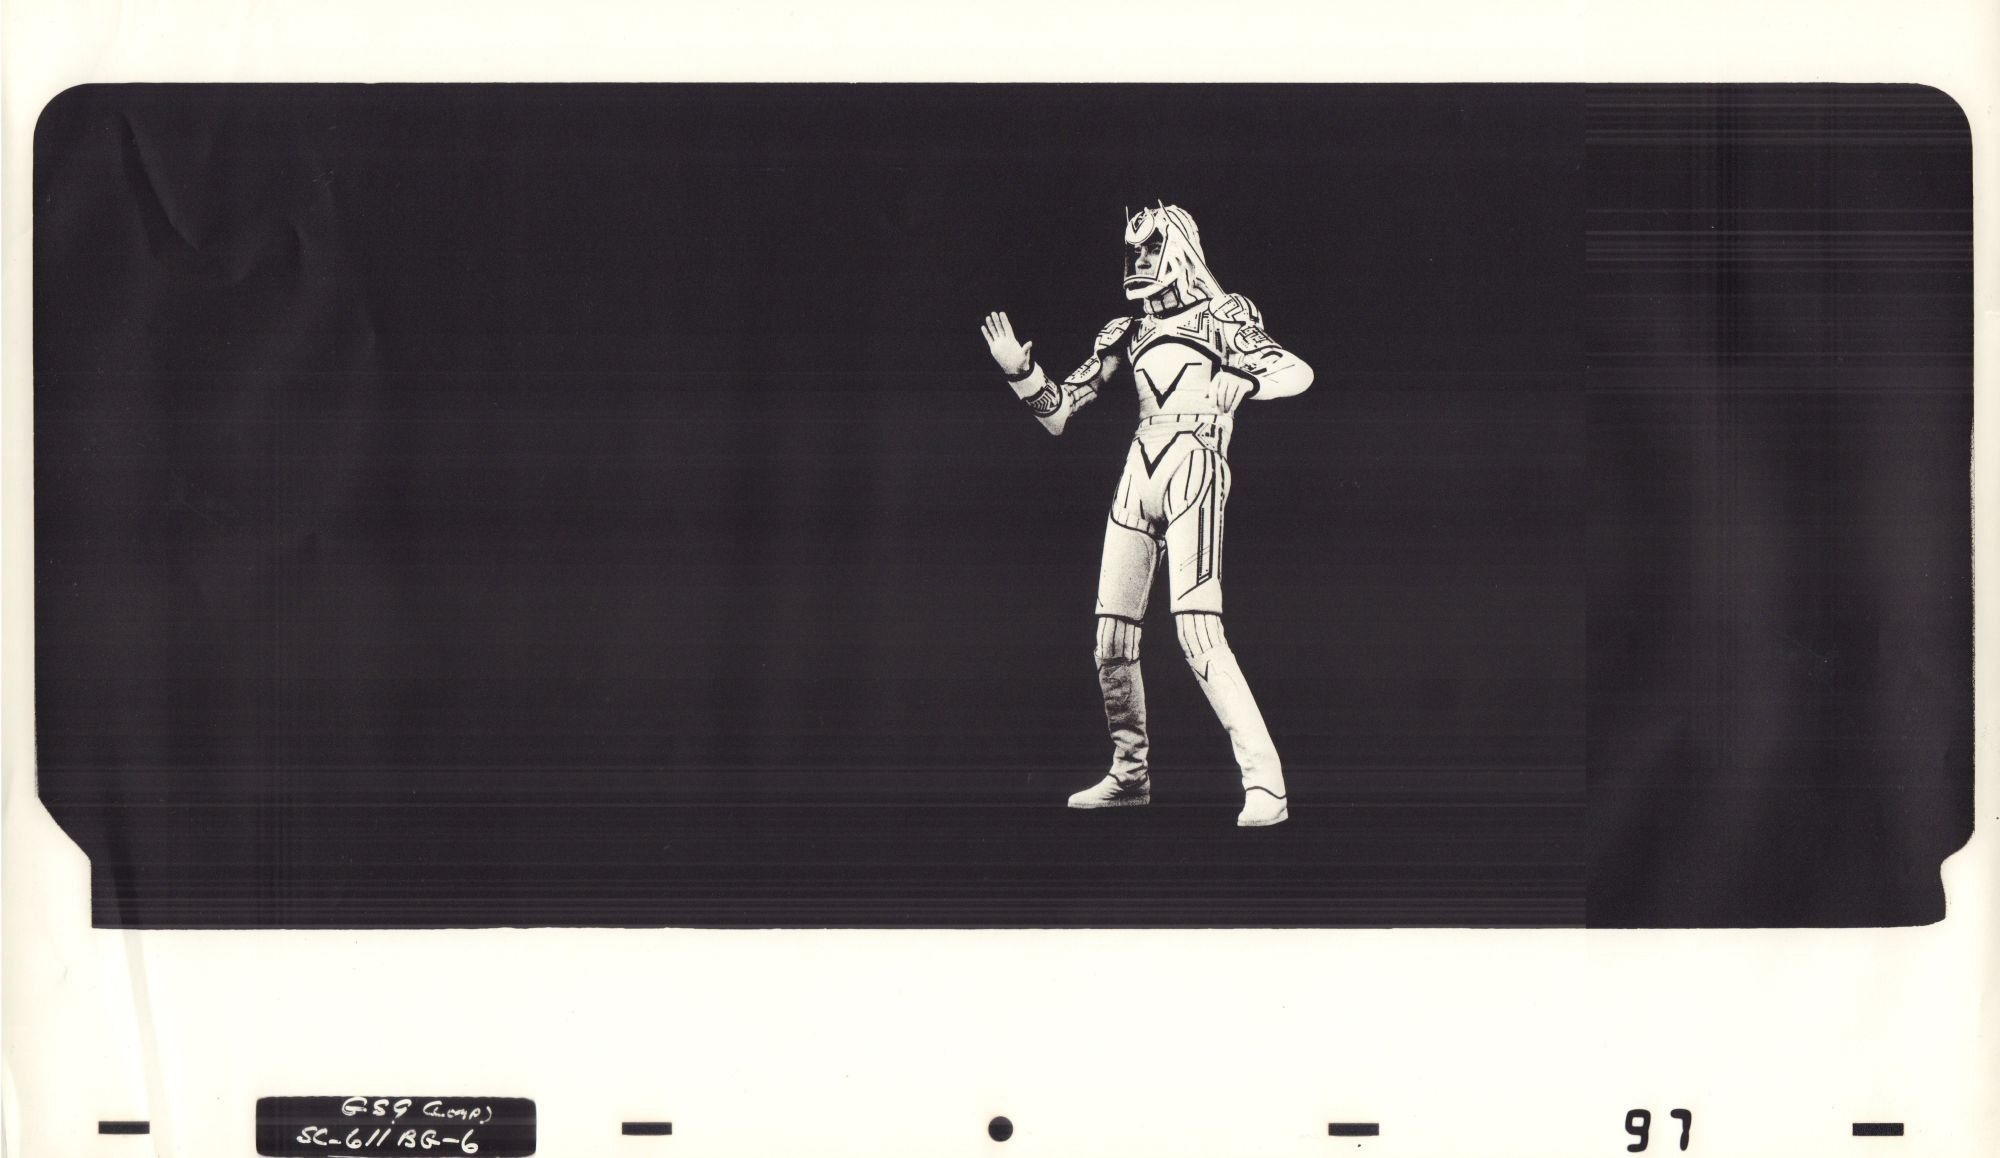 TRON (1982) GS-9/97